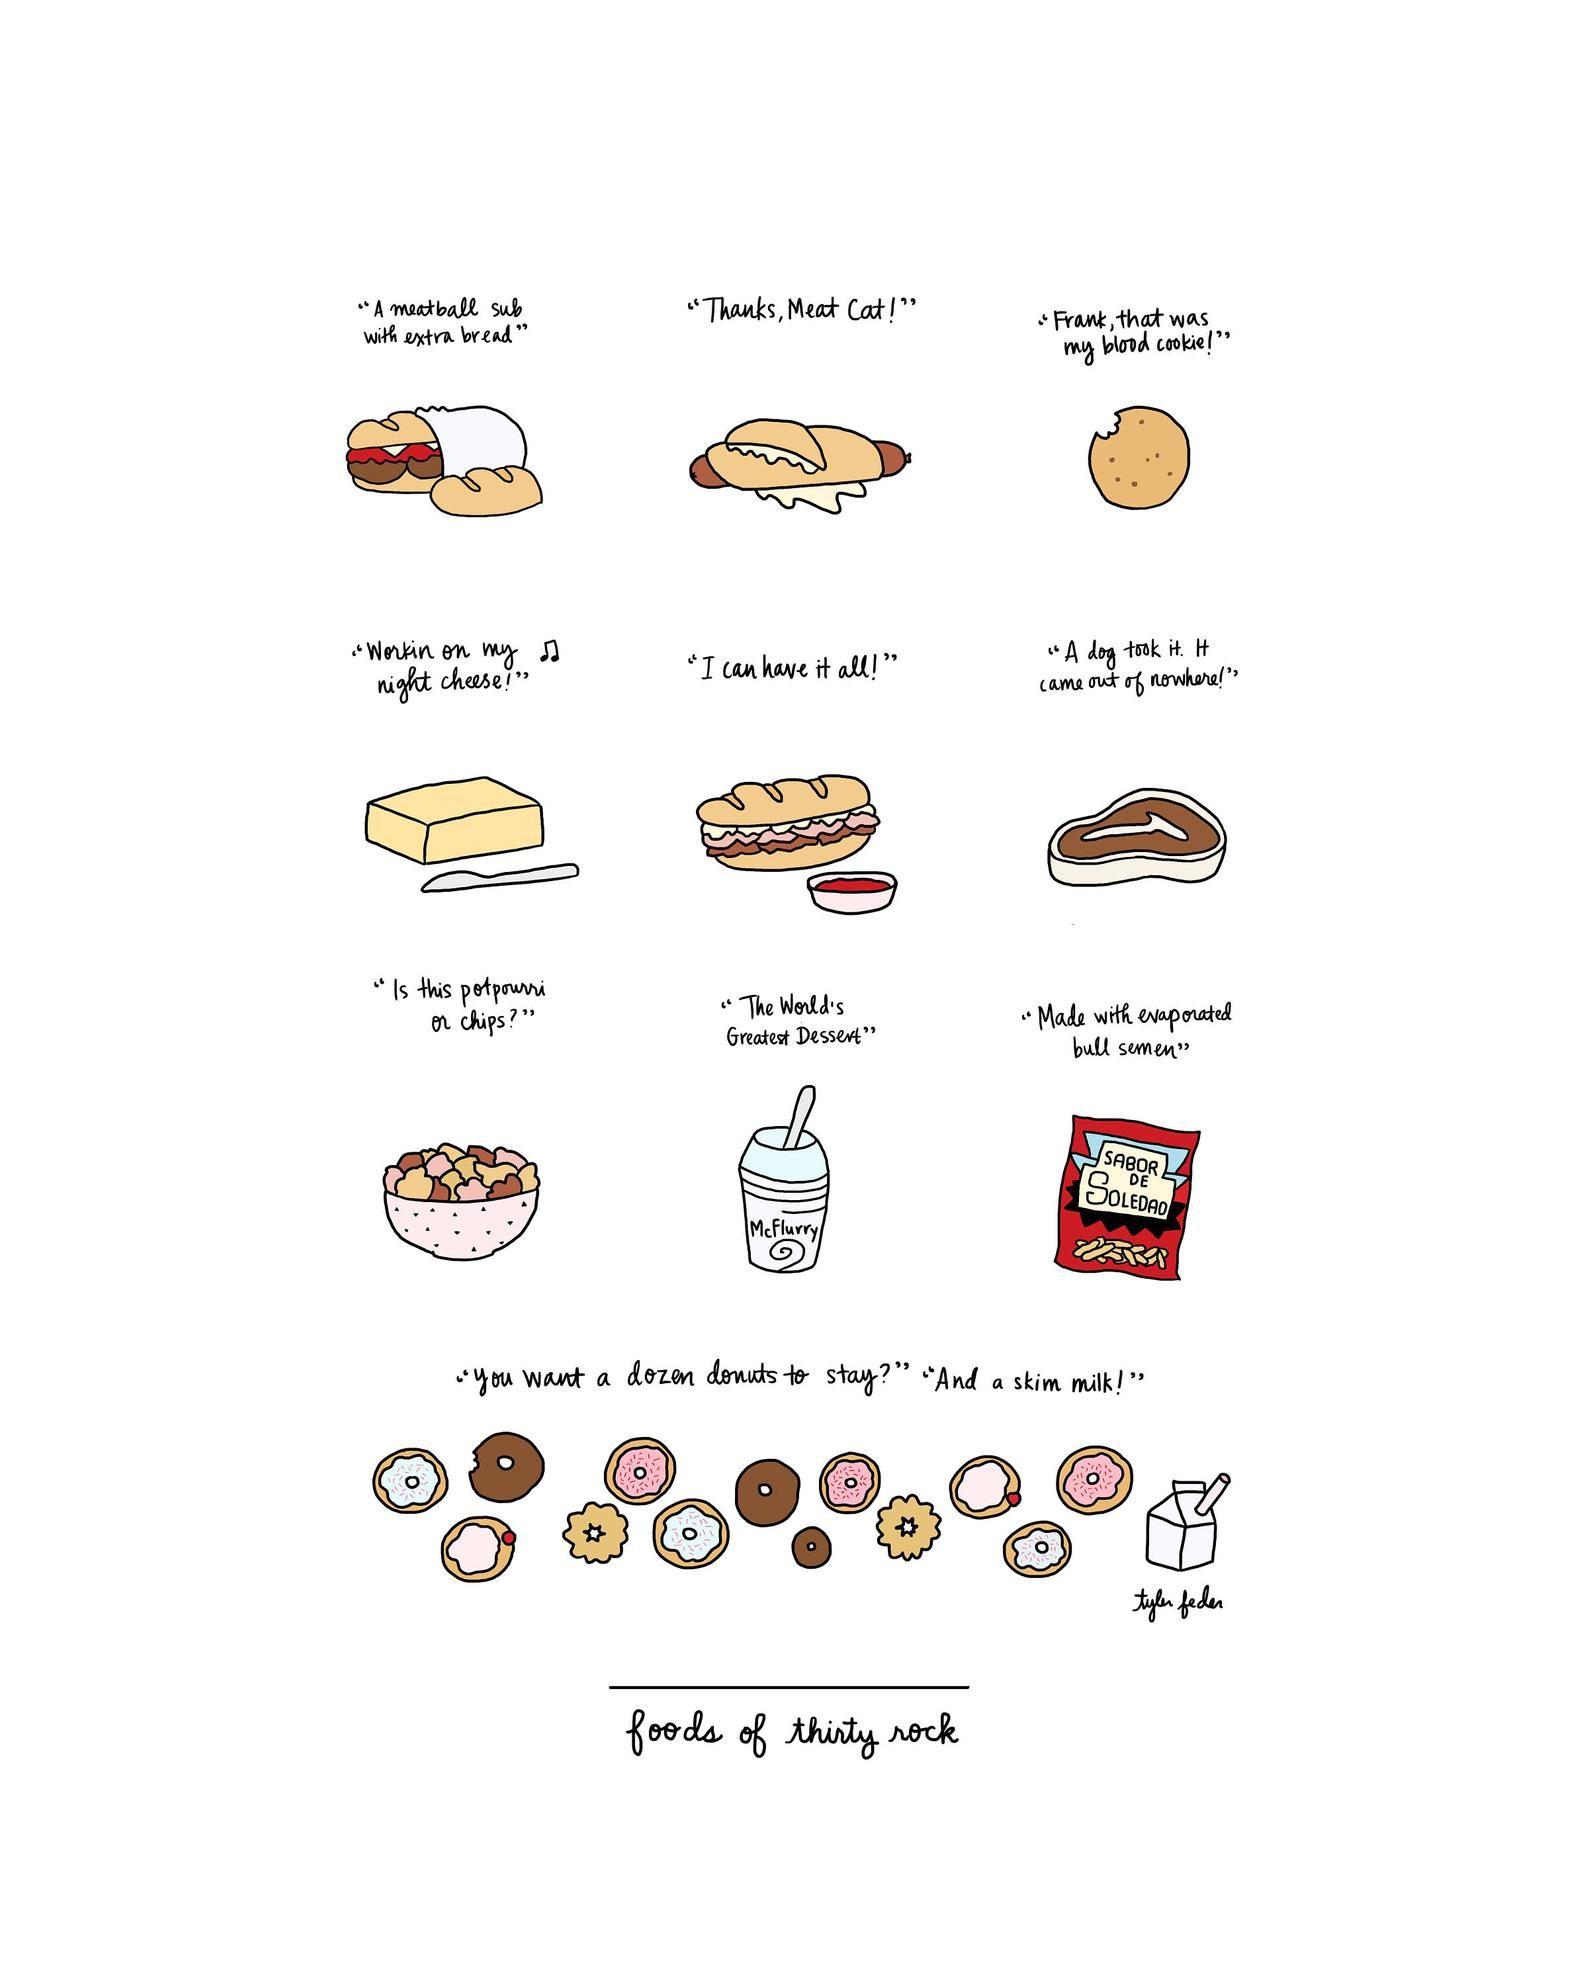 Foods of 30 Rock Digital Download | Etsy